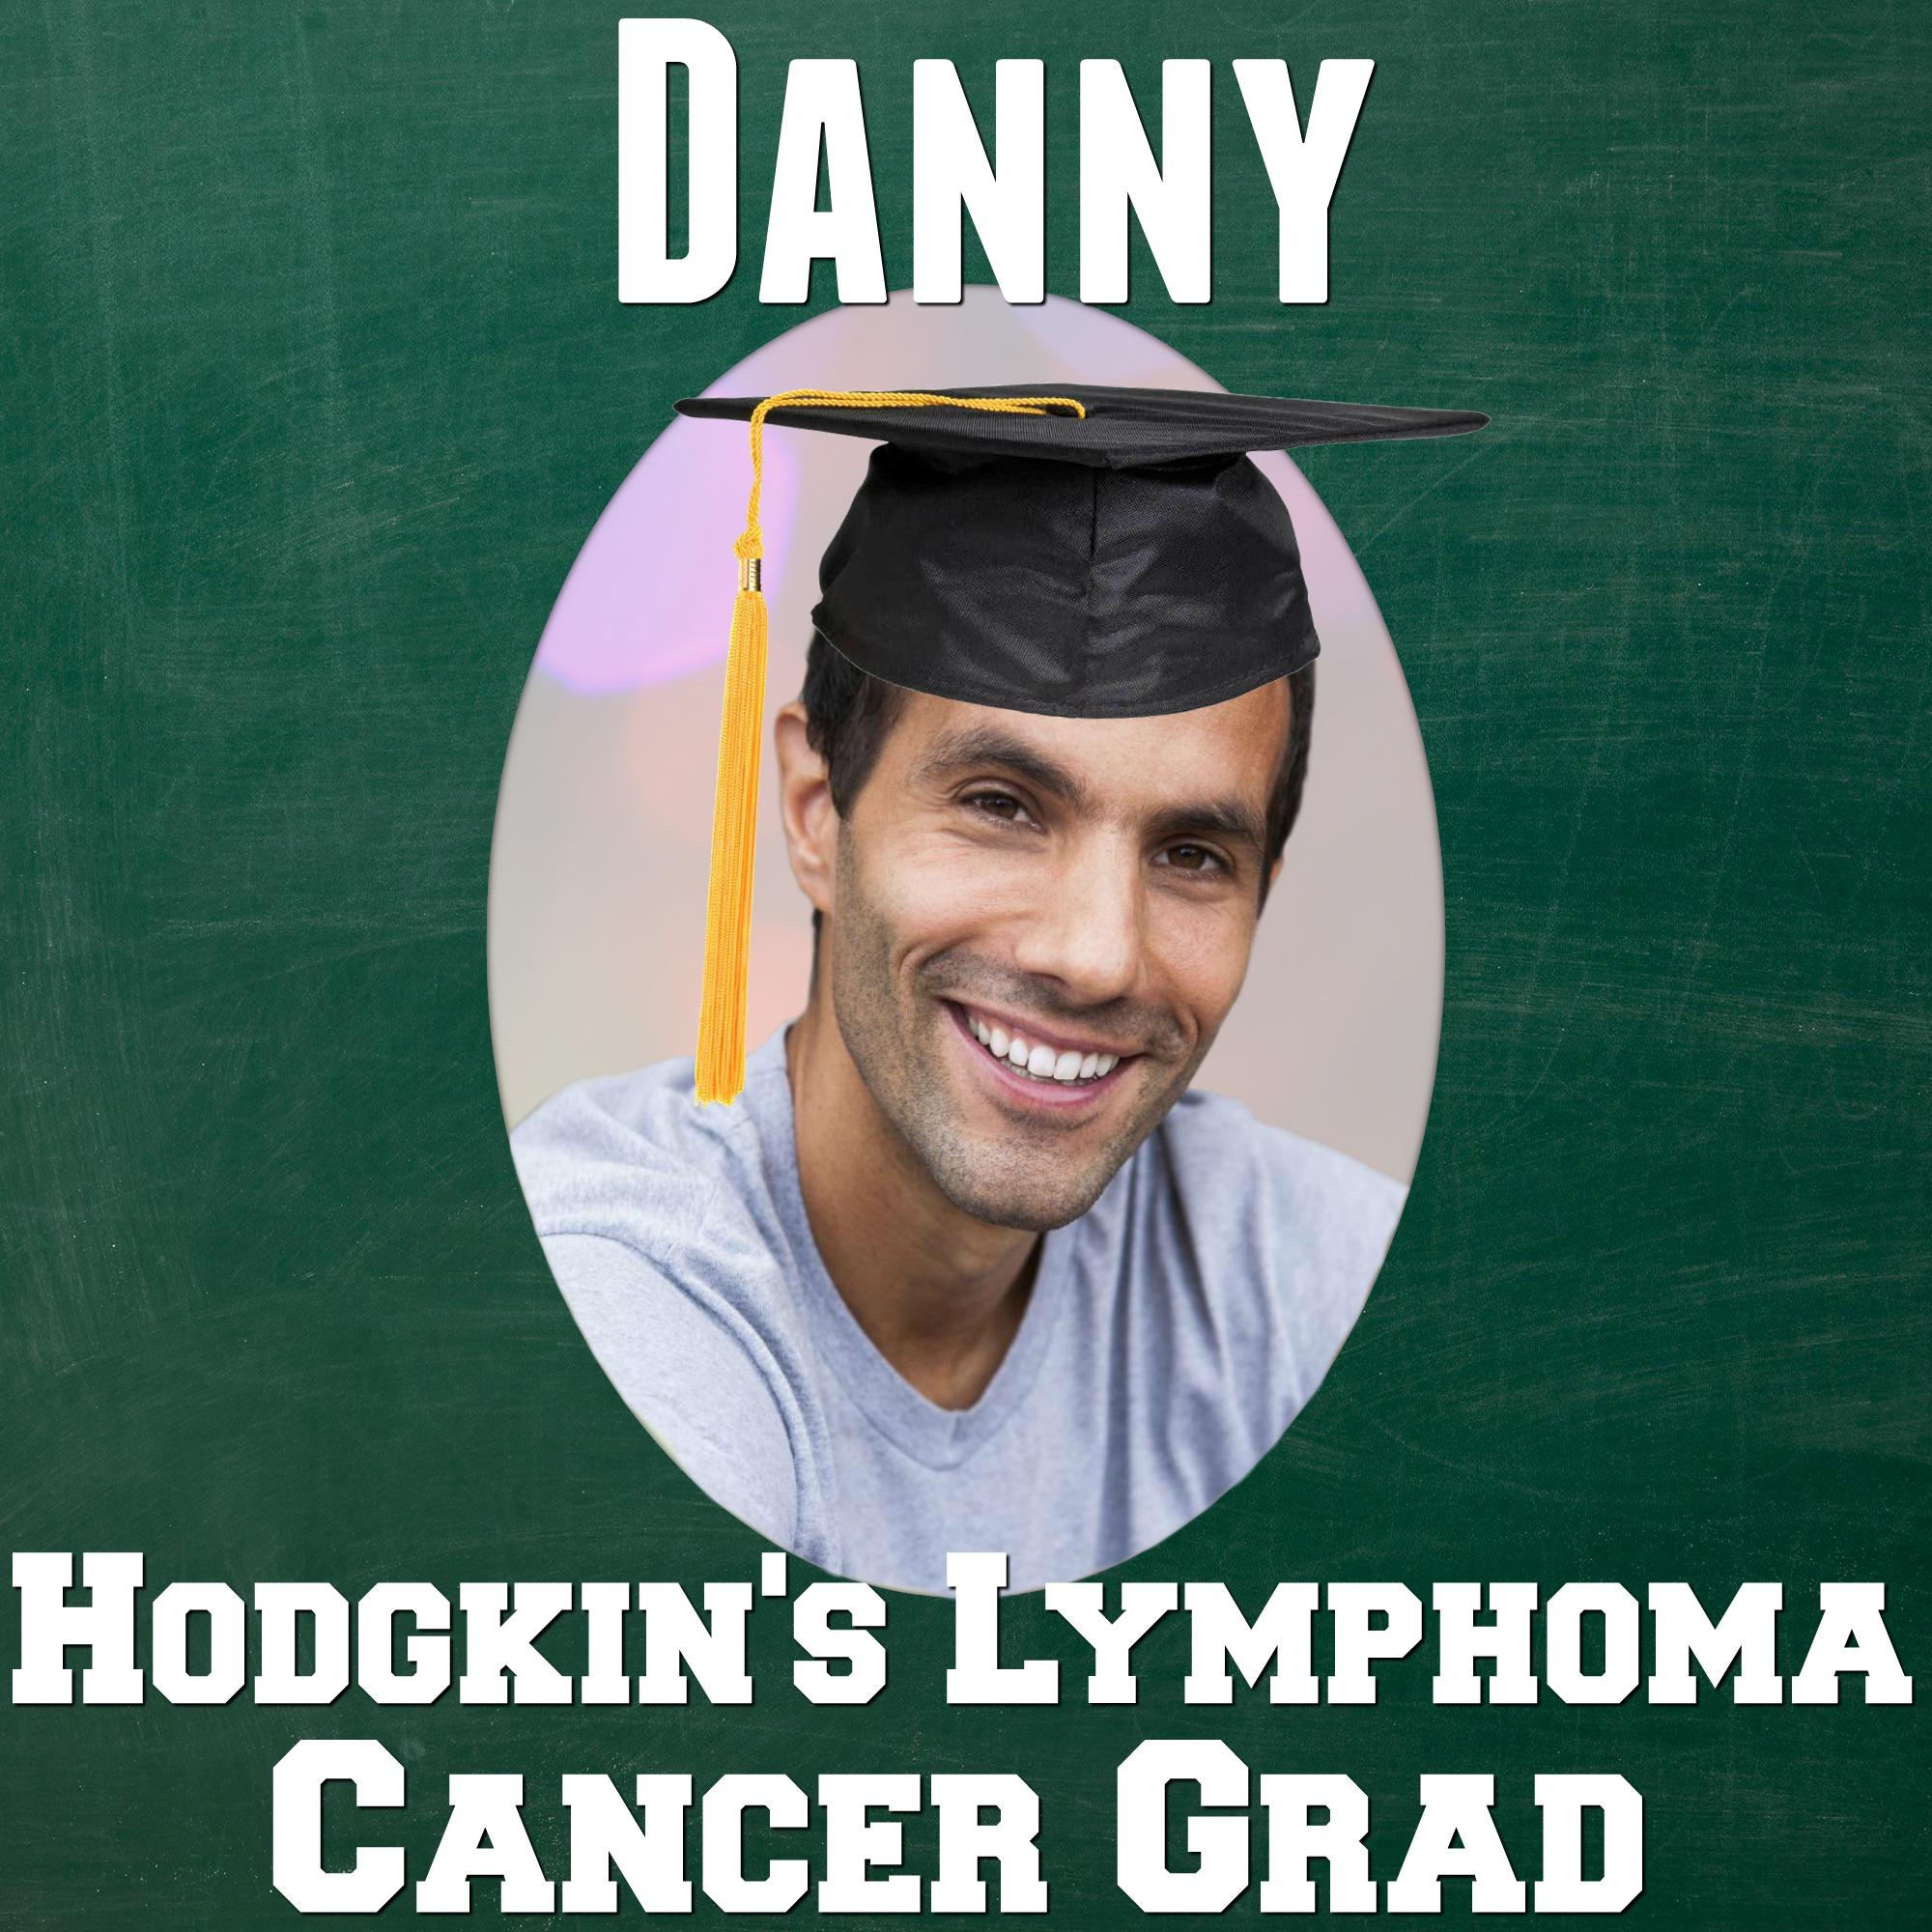 Danny Alotta Lymphoma Hodgkins CancerGrad Yearbook Cancer Grad